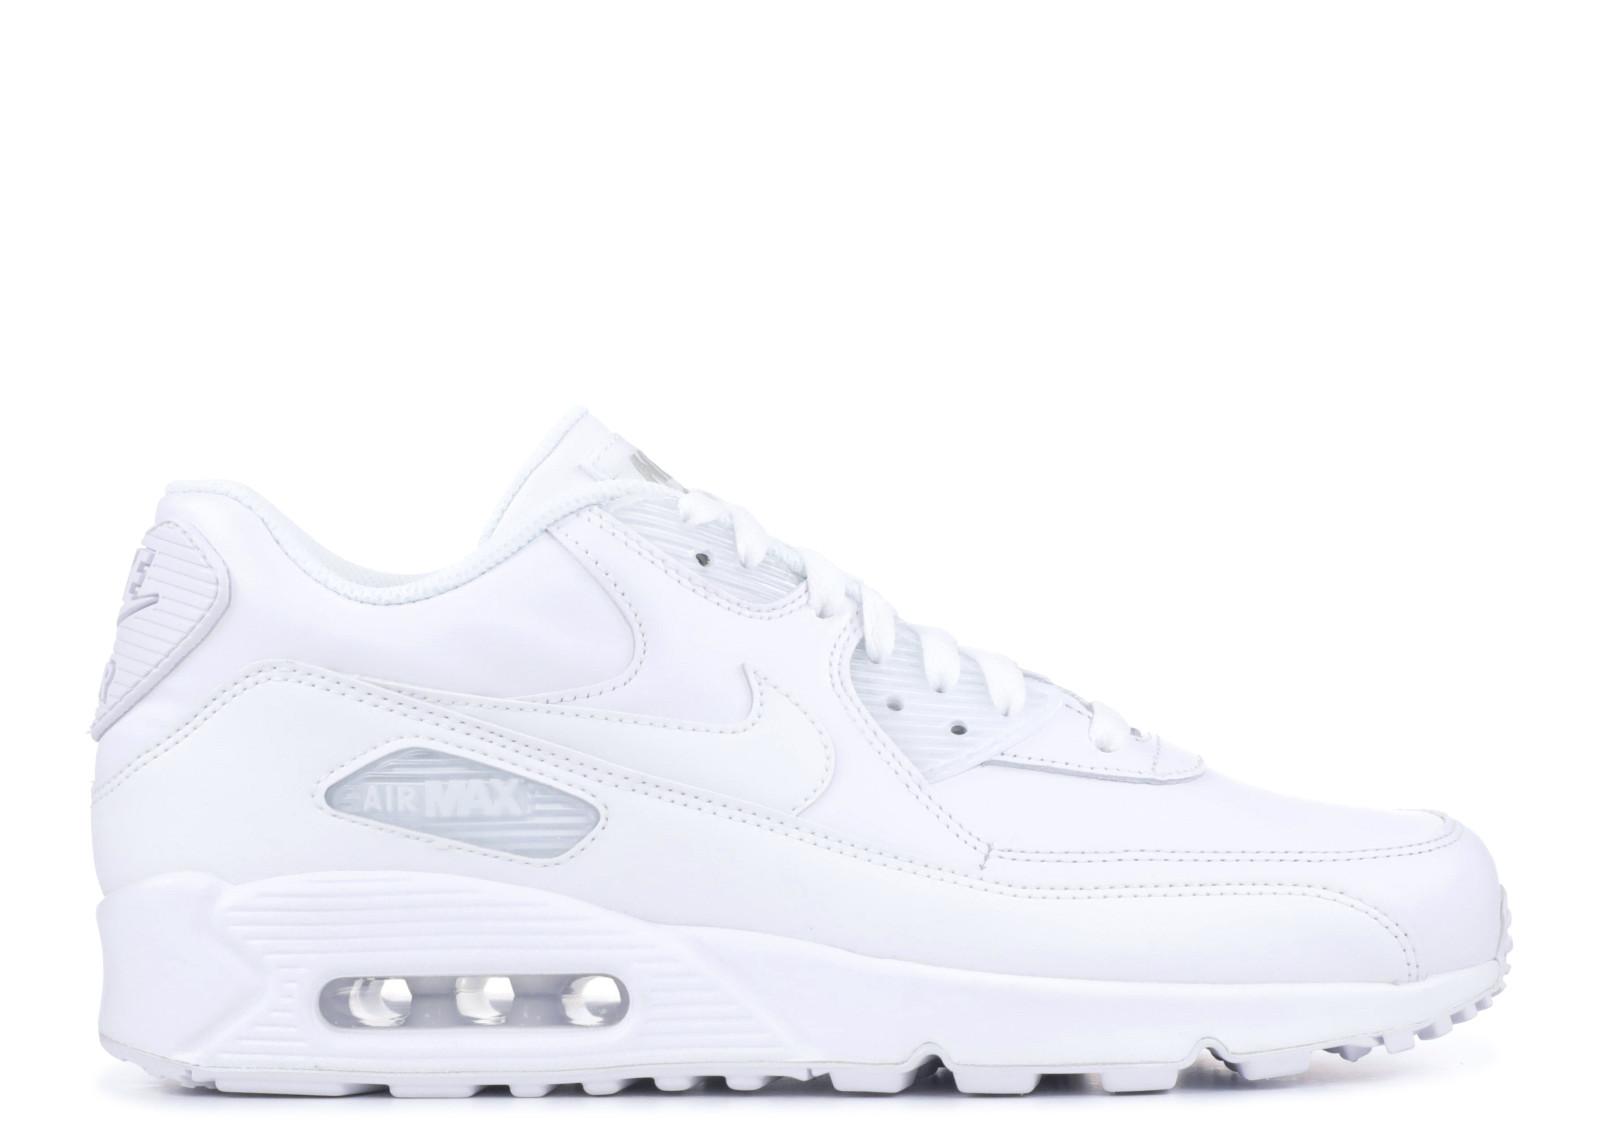 Nike obuv AIR MAX 90 LEATHER white Velikost: 10